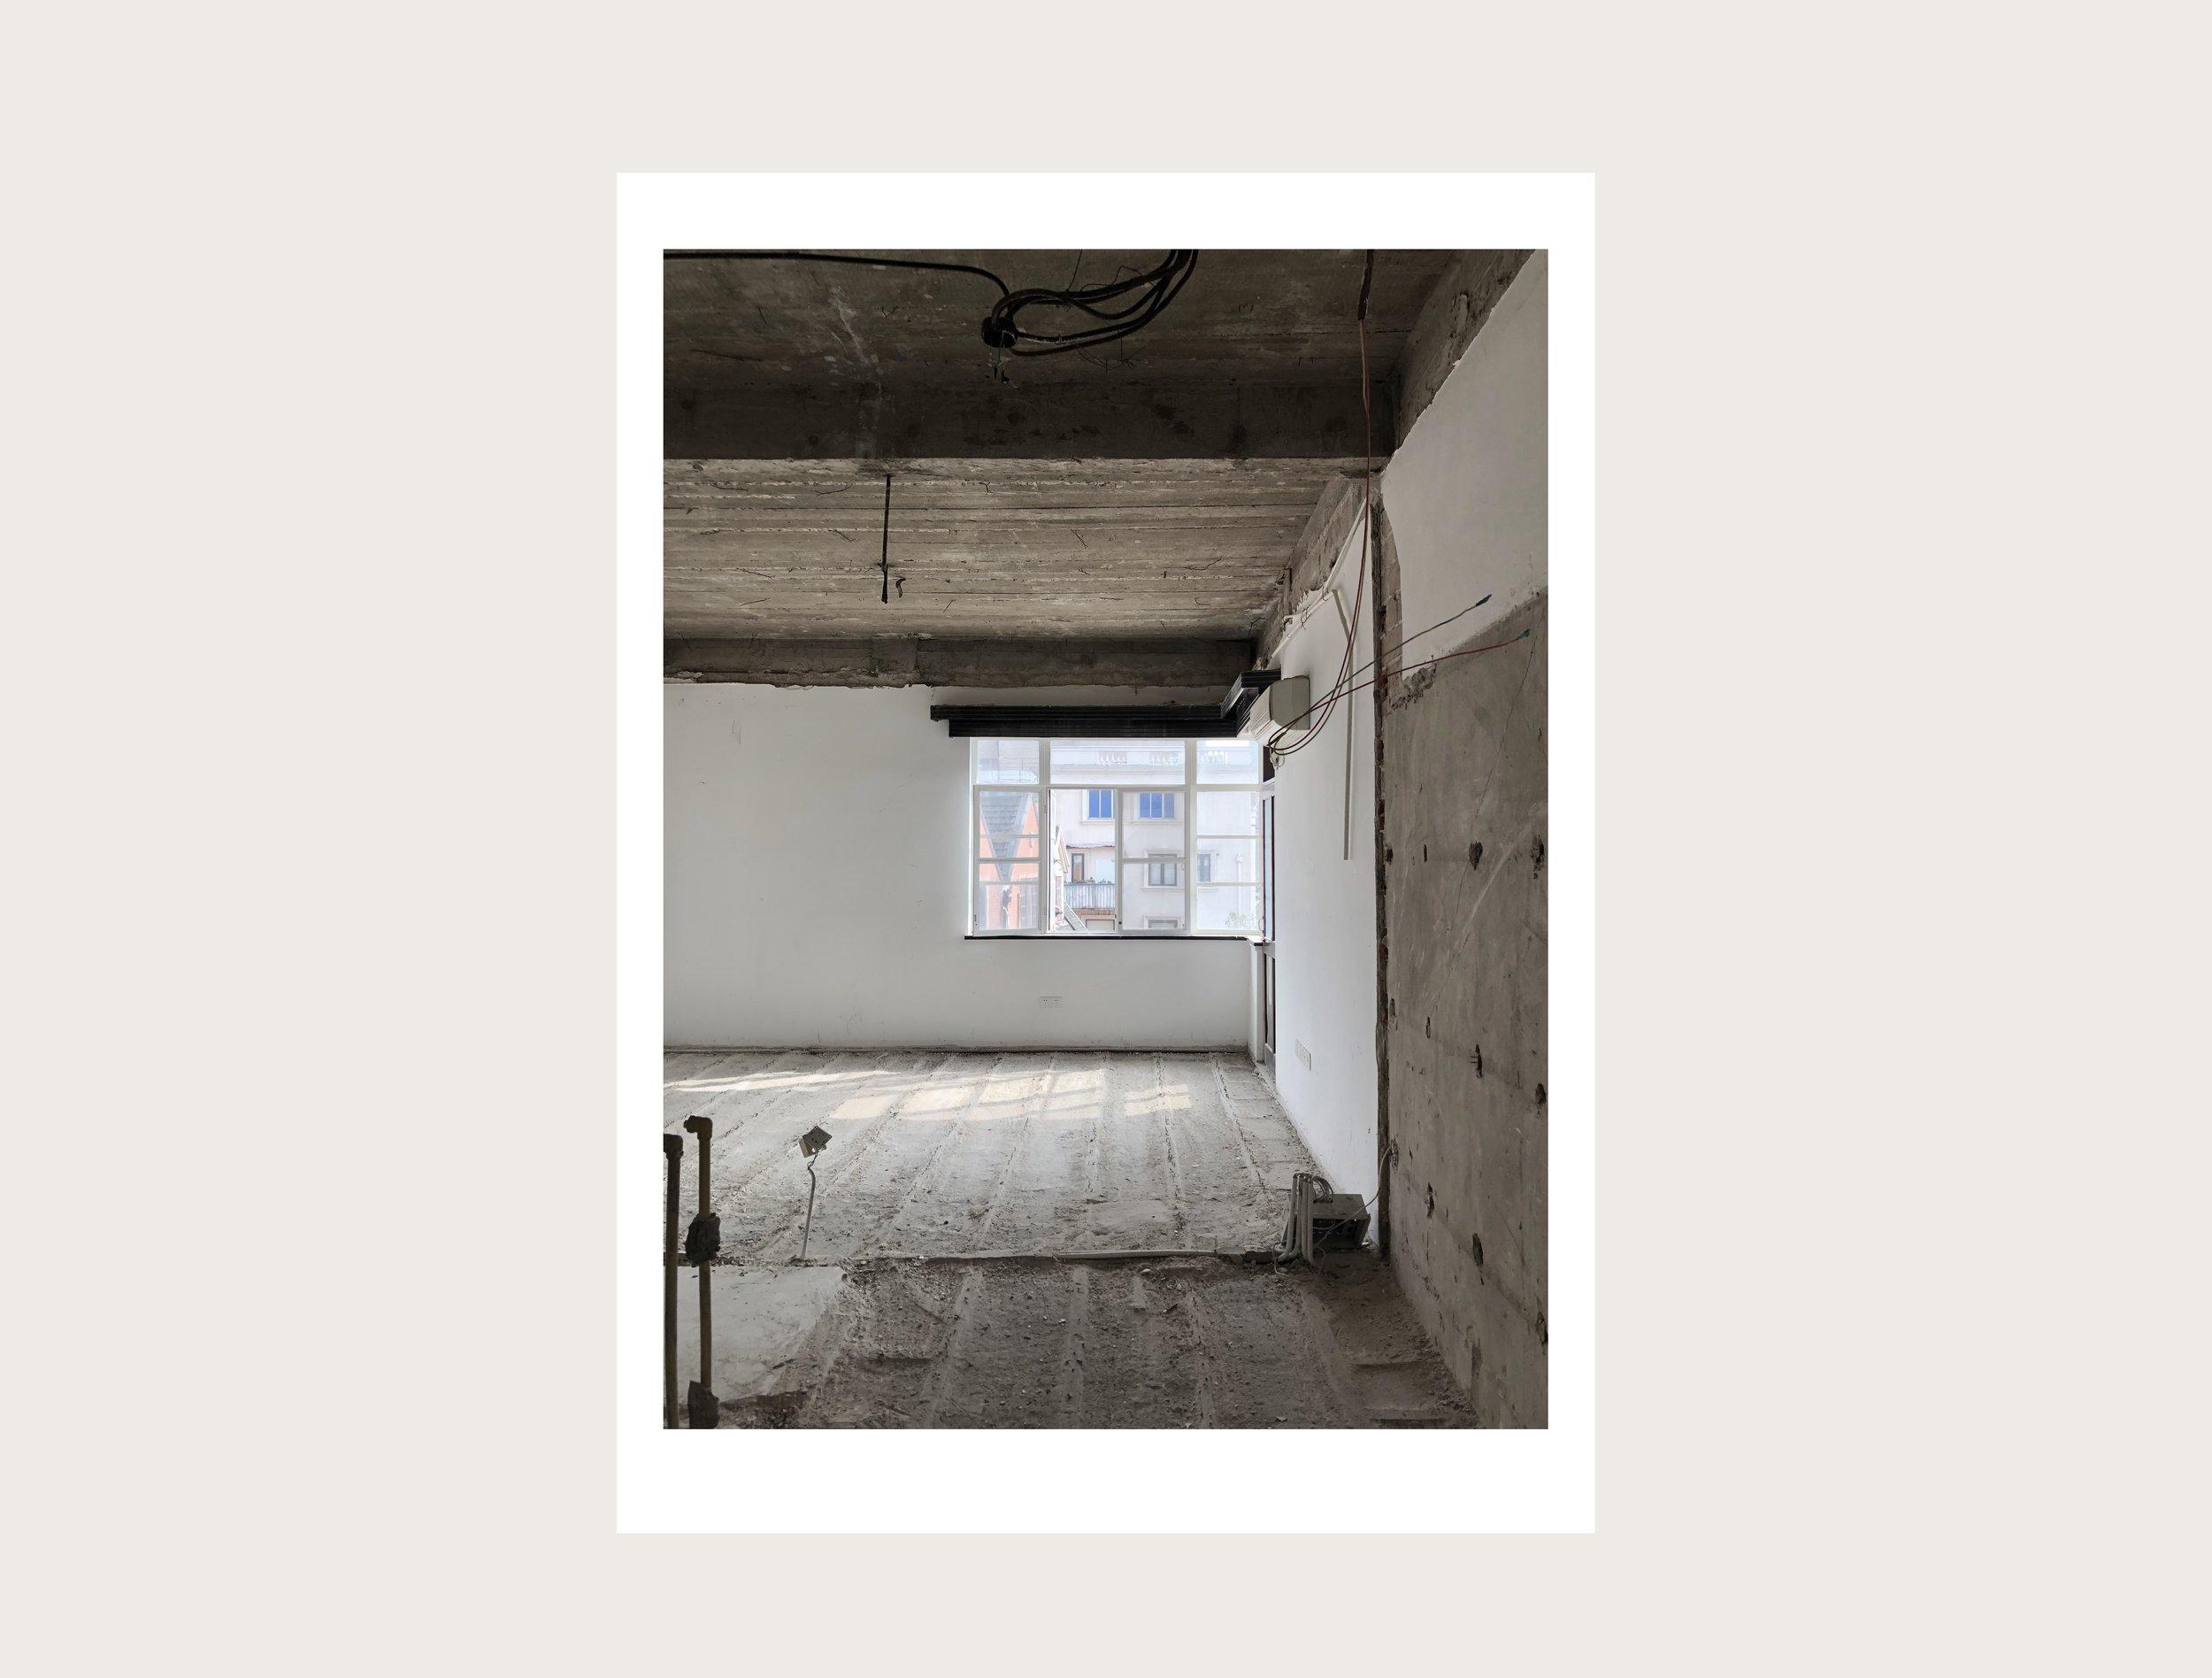 raams-architecture-design-studio-gascogne-apartment-house-shanghai-art-deco-china-02.jpg